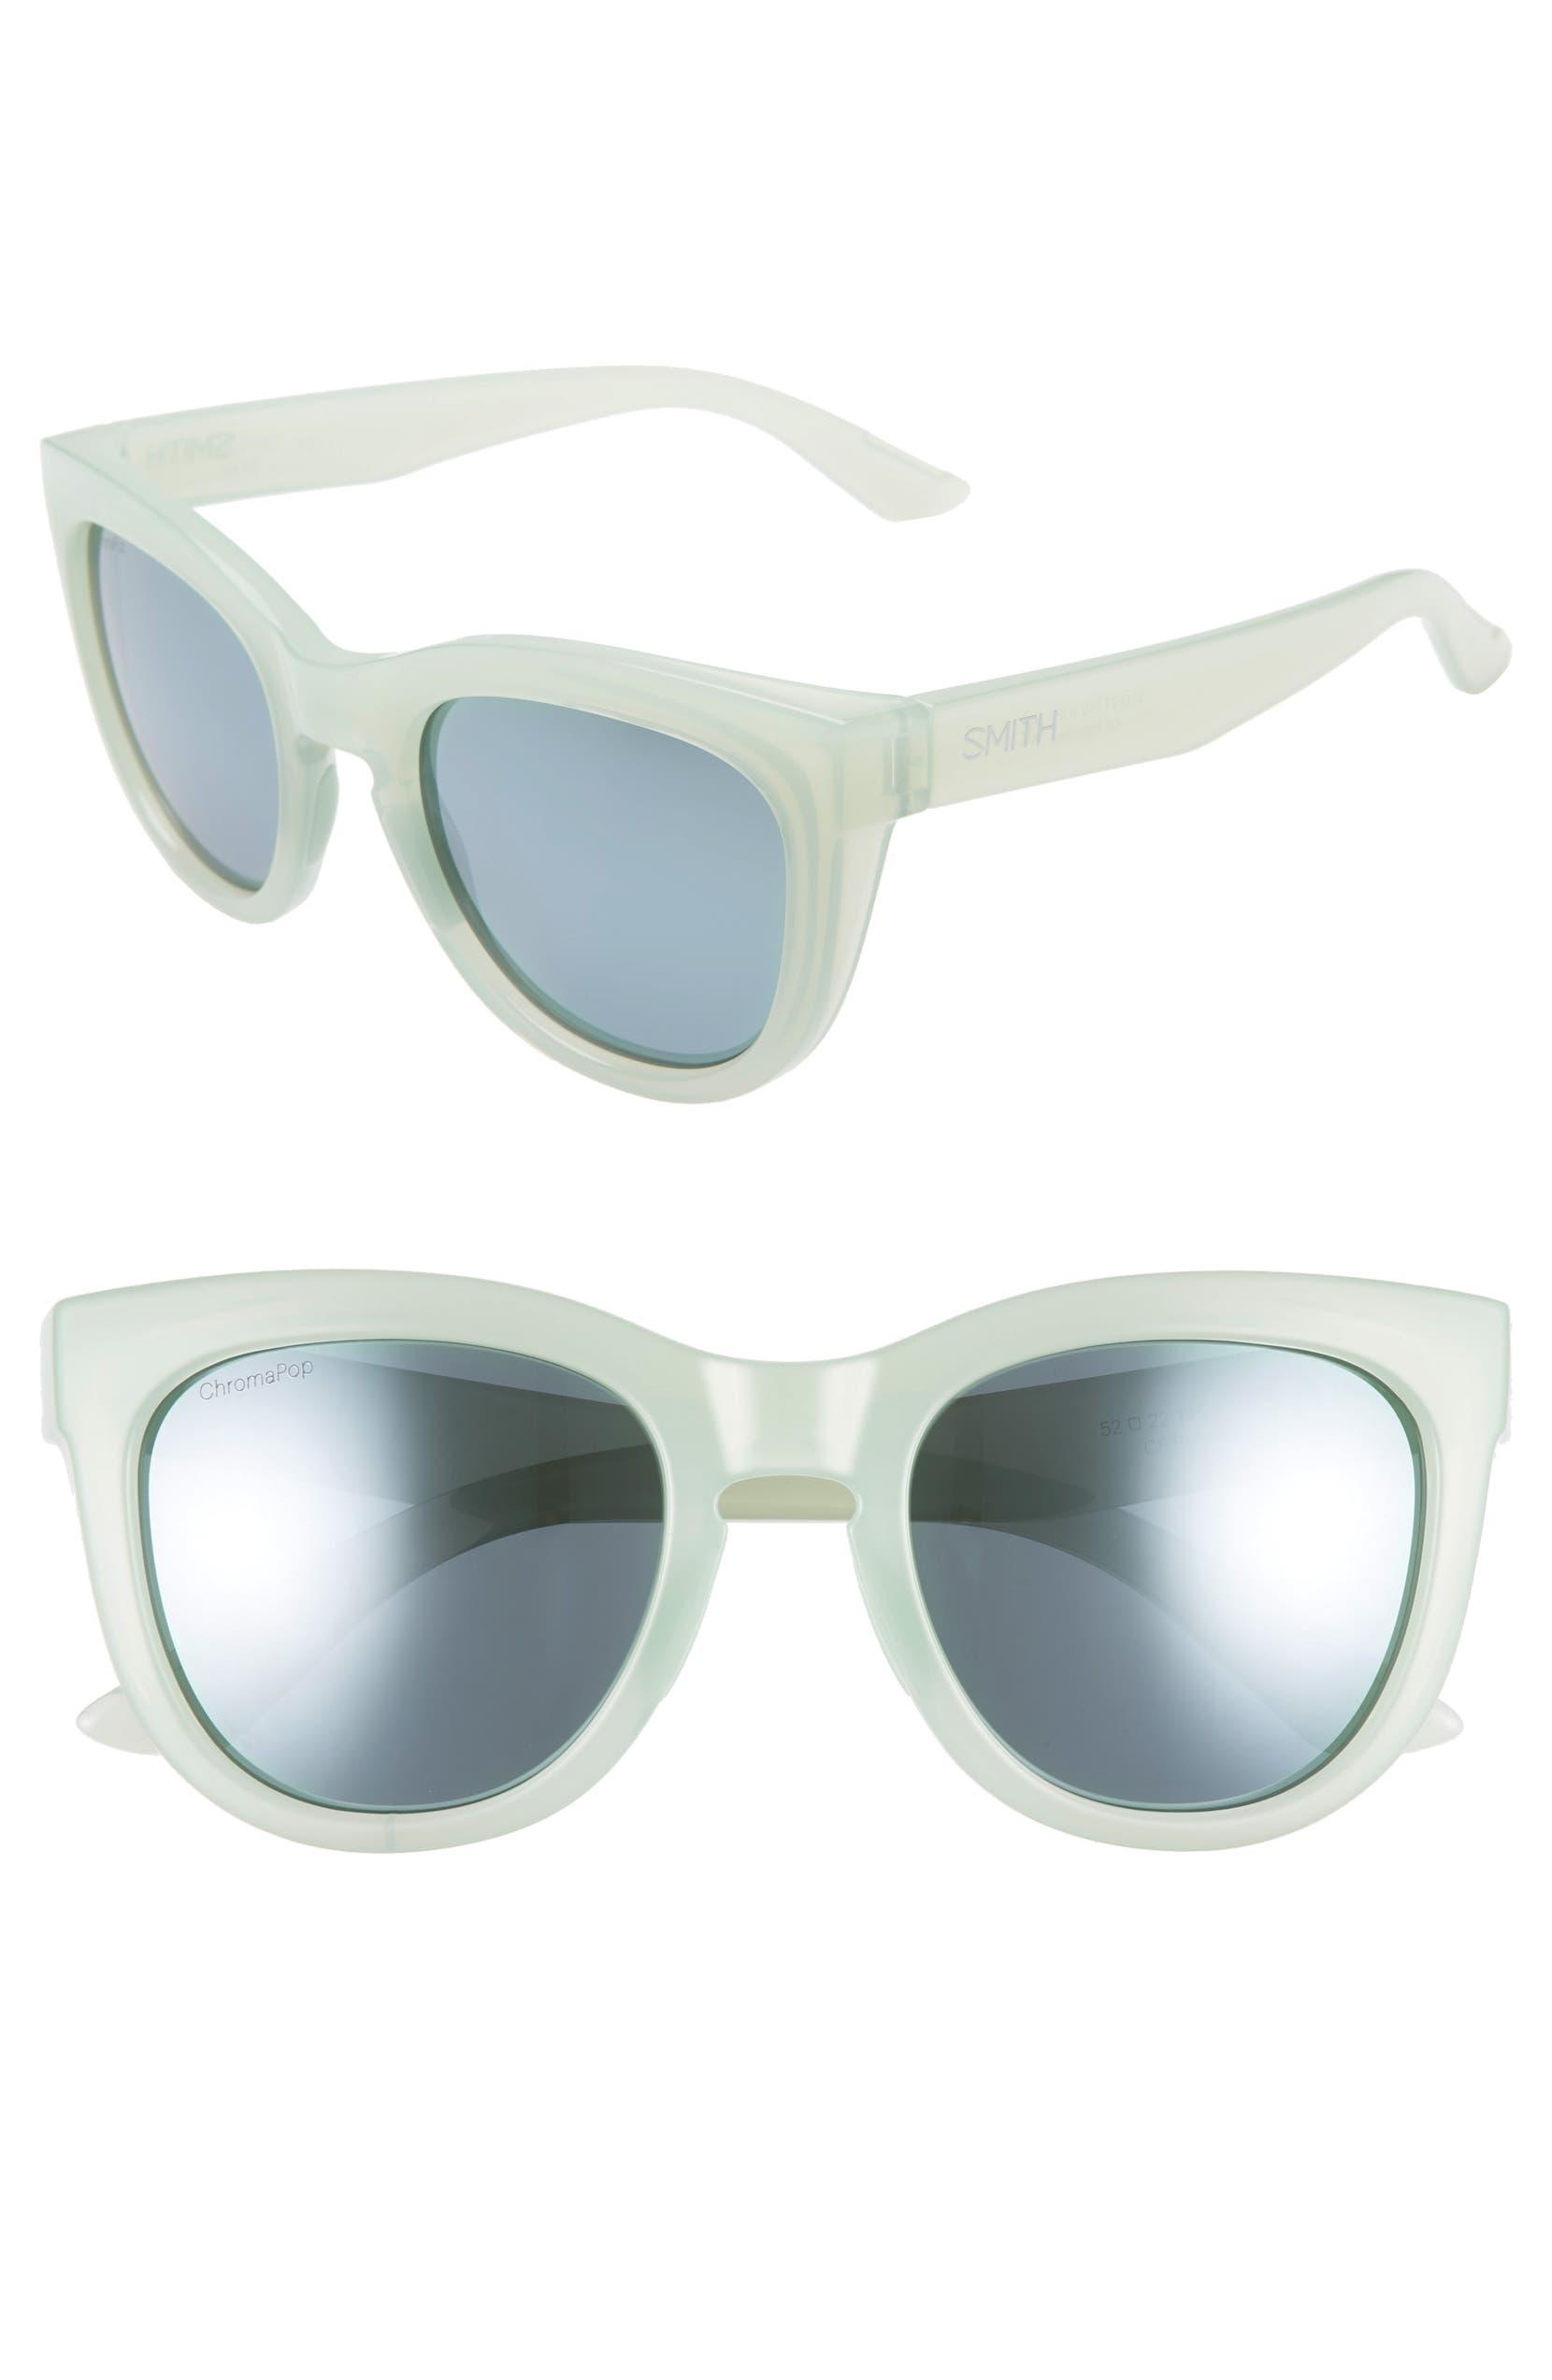 af6f905287 Smith  Sidney  55mm Polarized Sunglasses